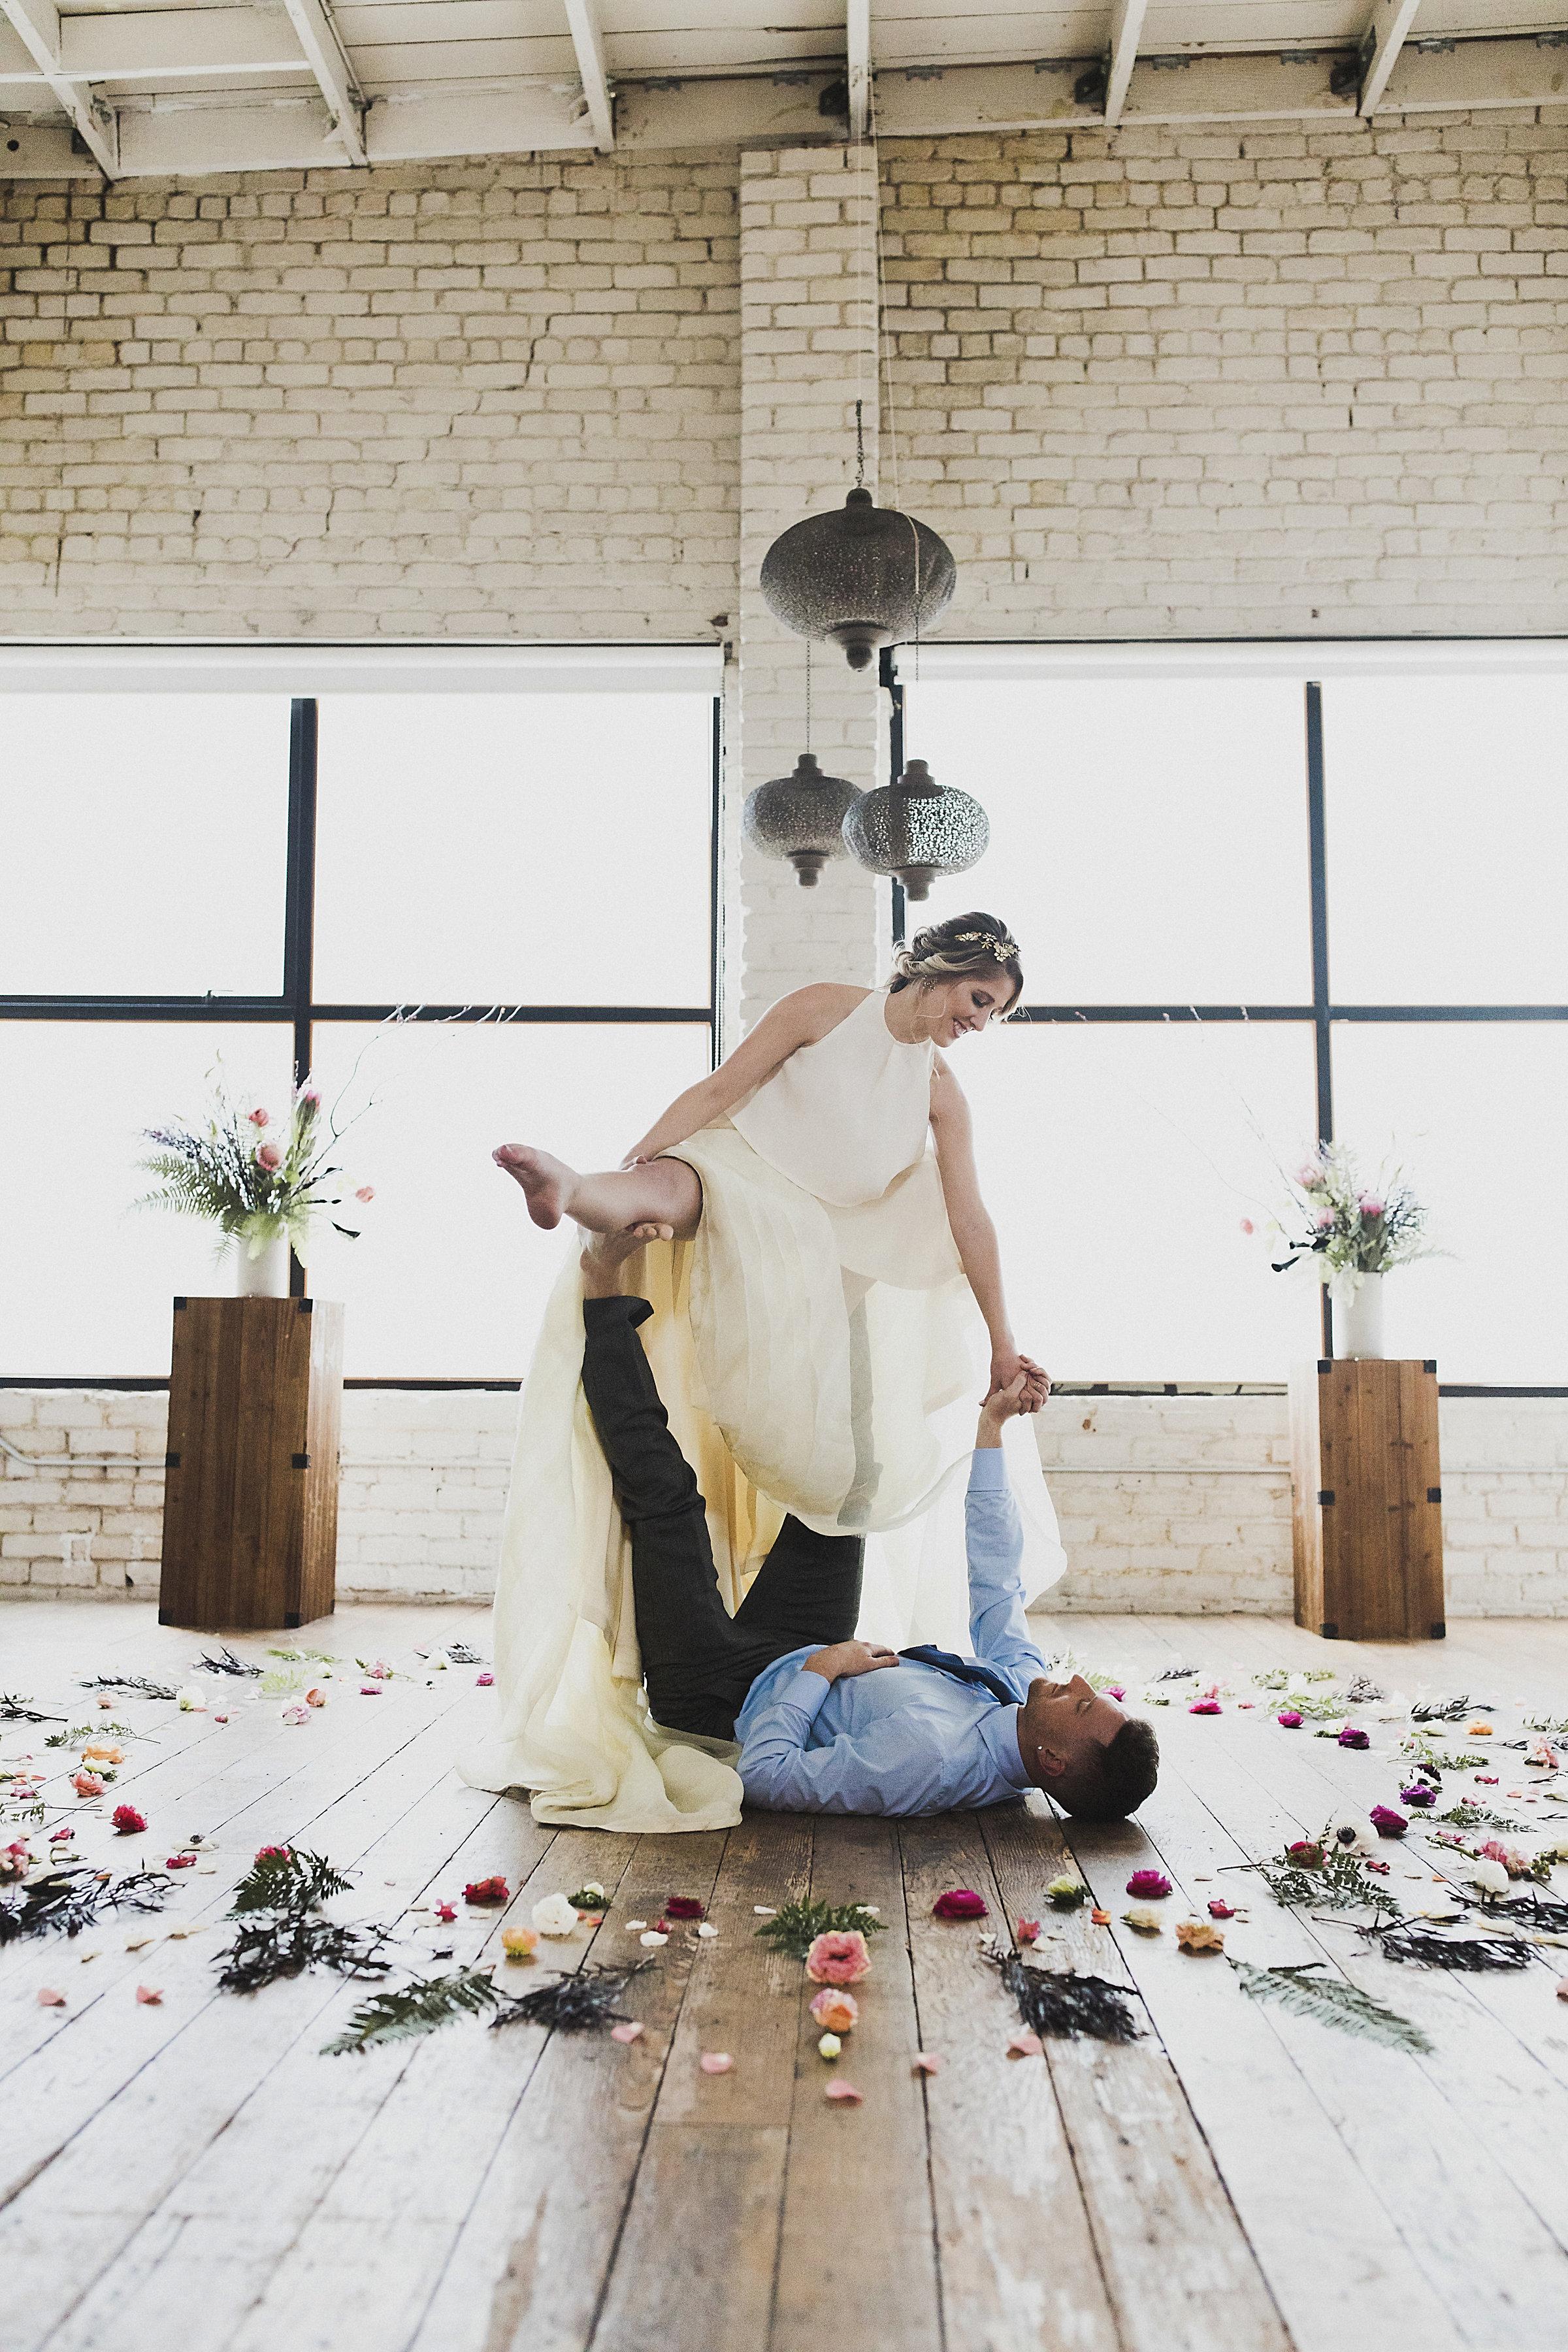 styled-yoga-shoot-heatherelizabethphotography-208.JPG